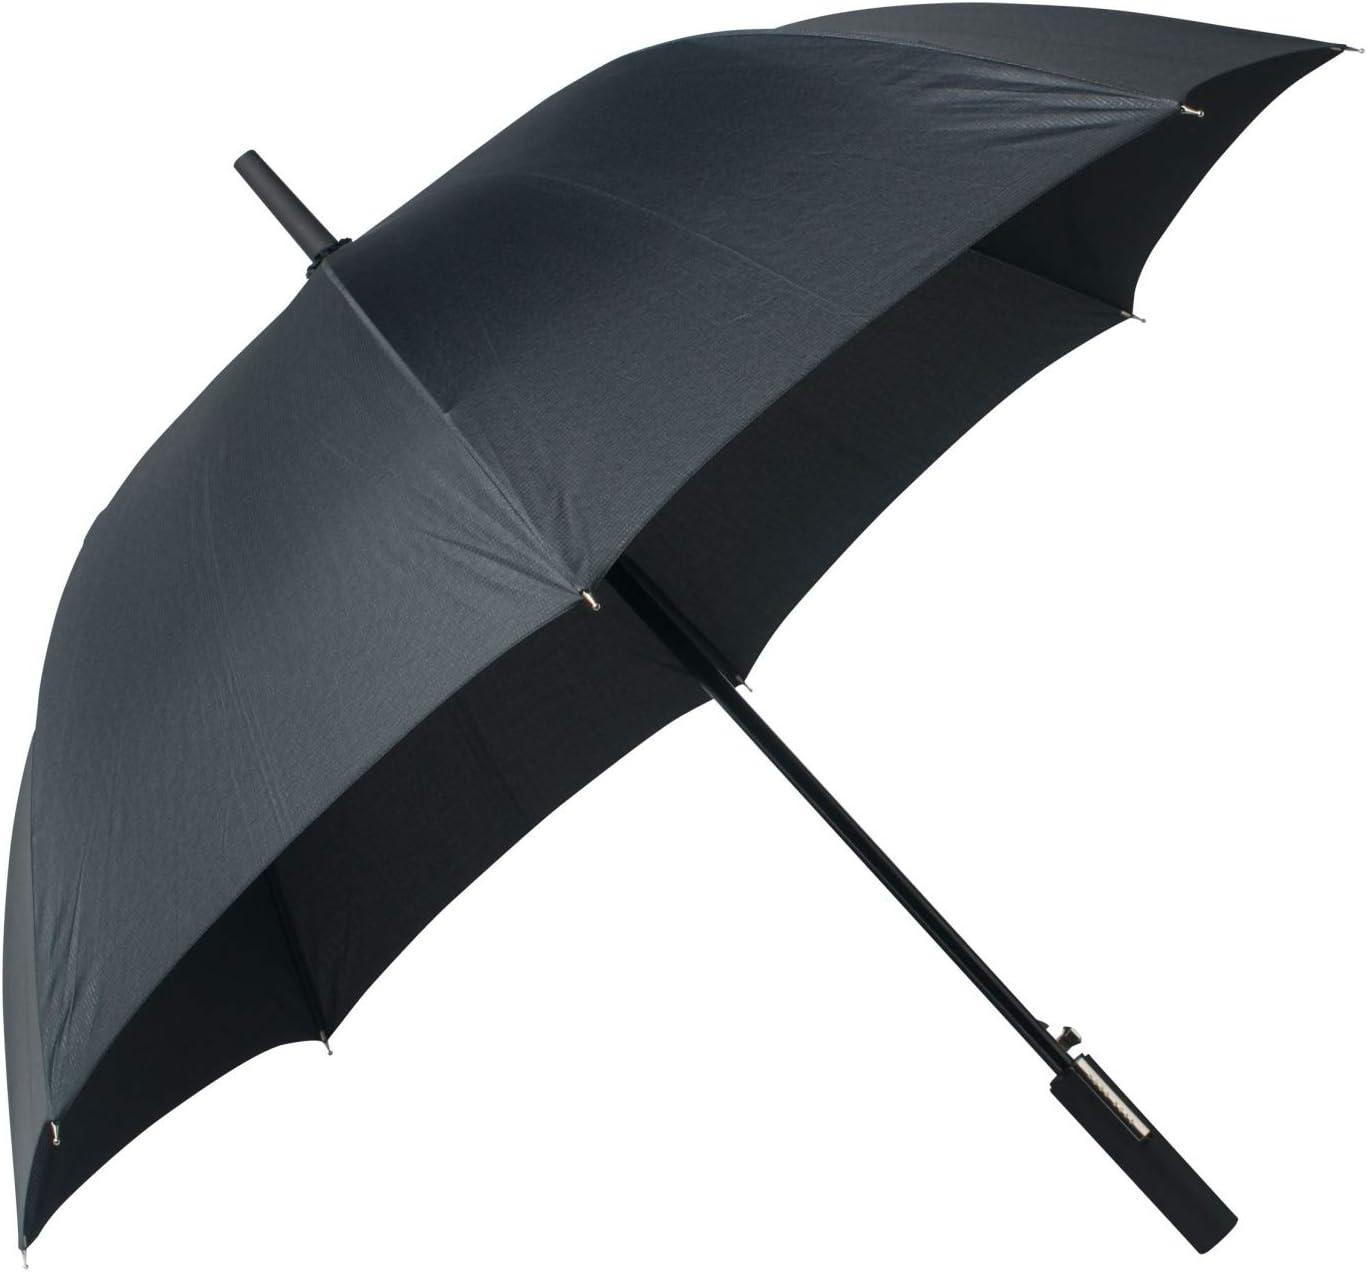 Grey 130 cm Hugo Boss Illusion Parapluie canne